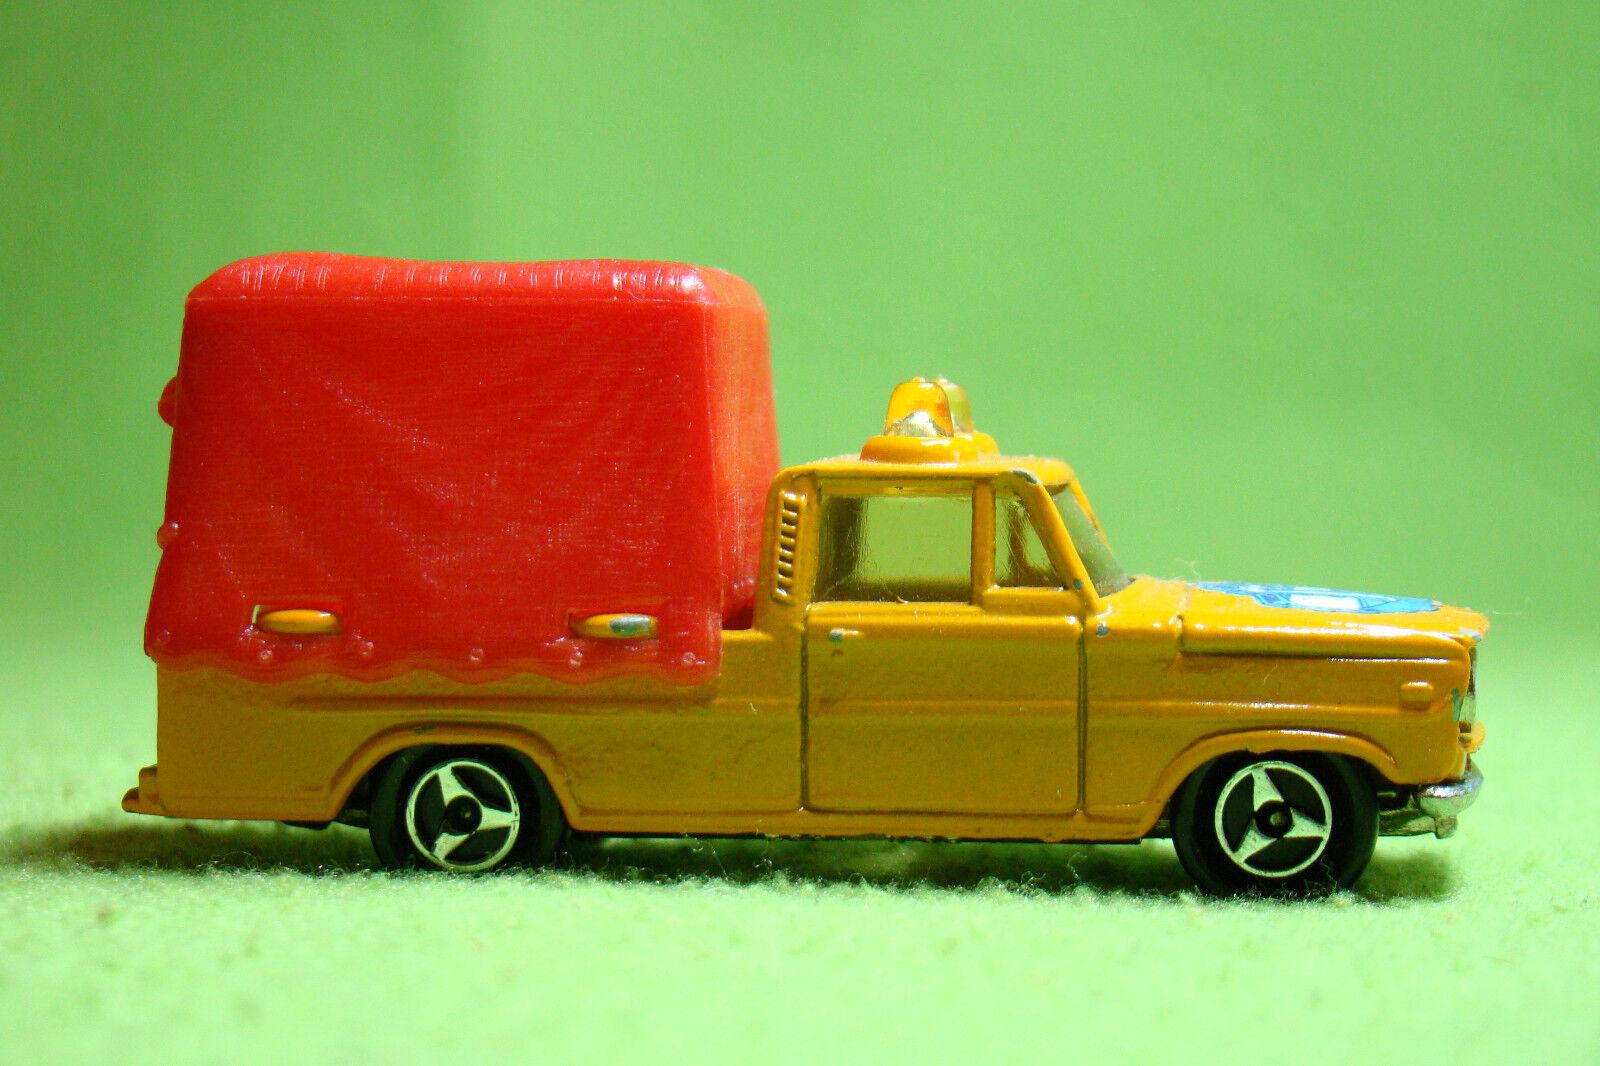 Modellauto - - - Majorette 374 - PKW mit Planen Anhänger - OVP f3a23d